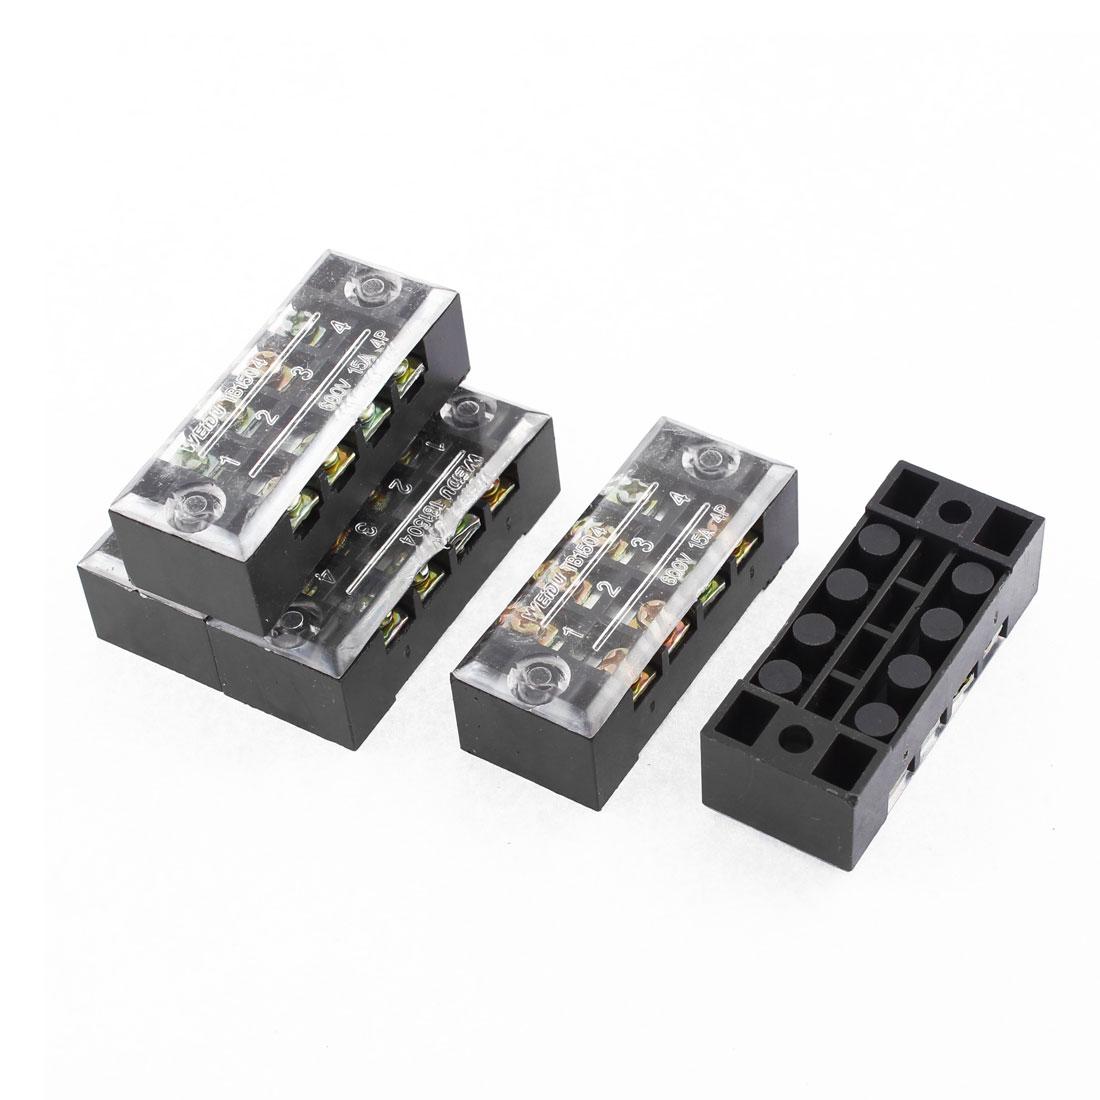 AC 600V 15A Dual Row 4P Screw Terminal Electric Barrier Strip Block 5 Pcs